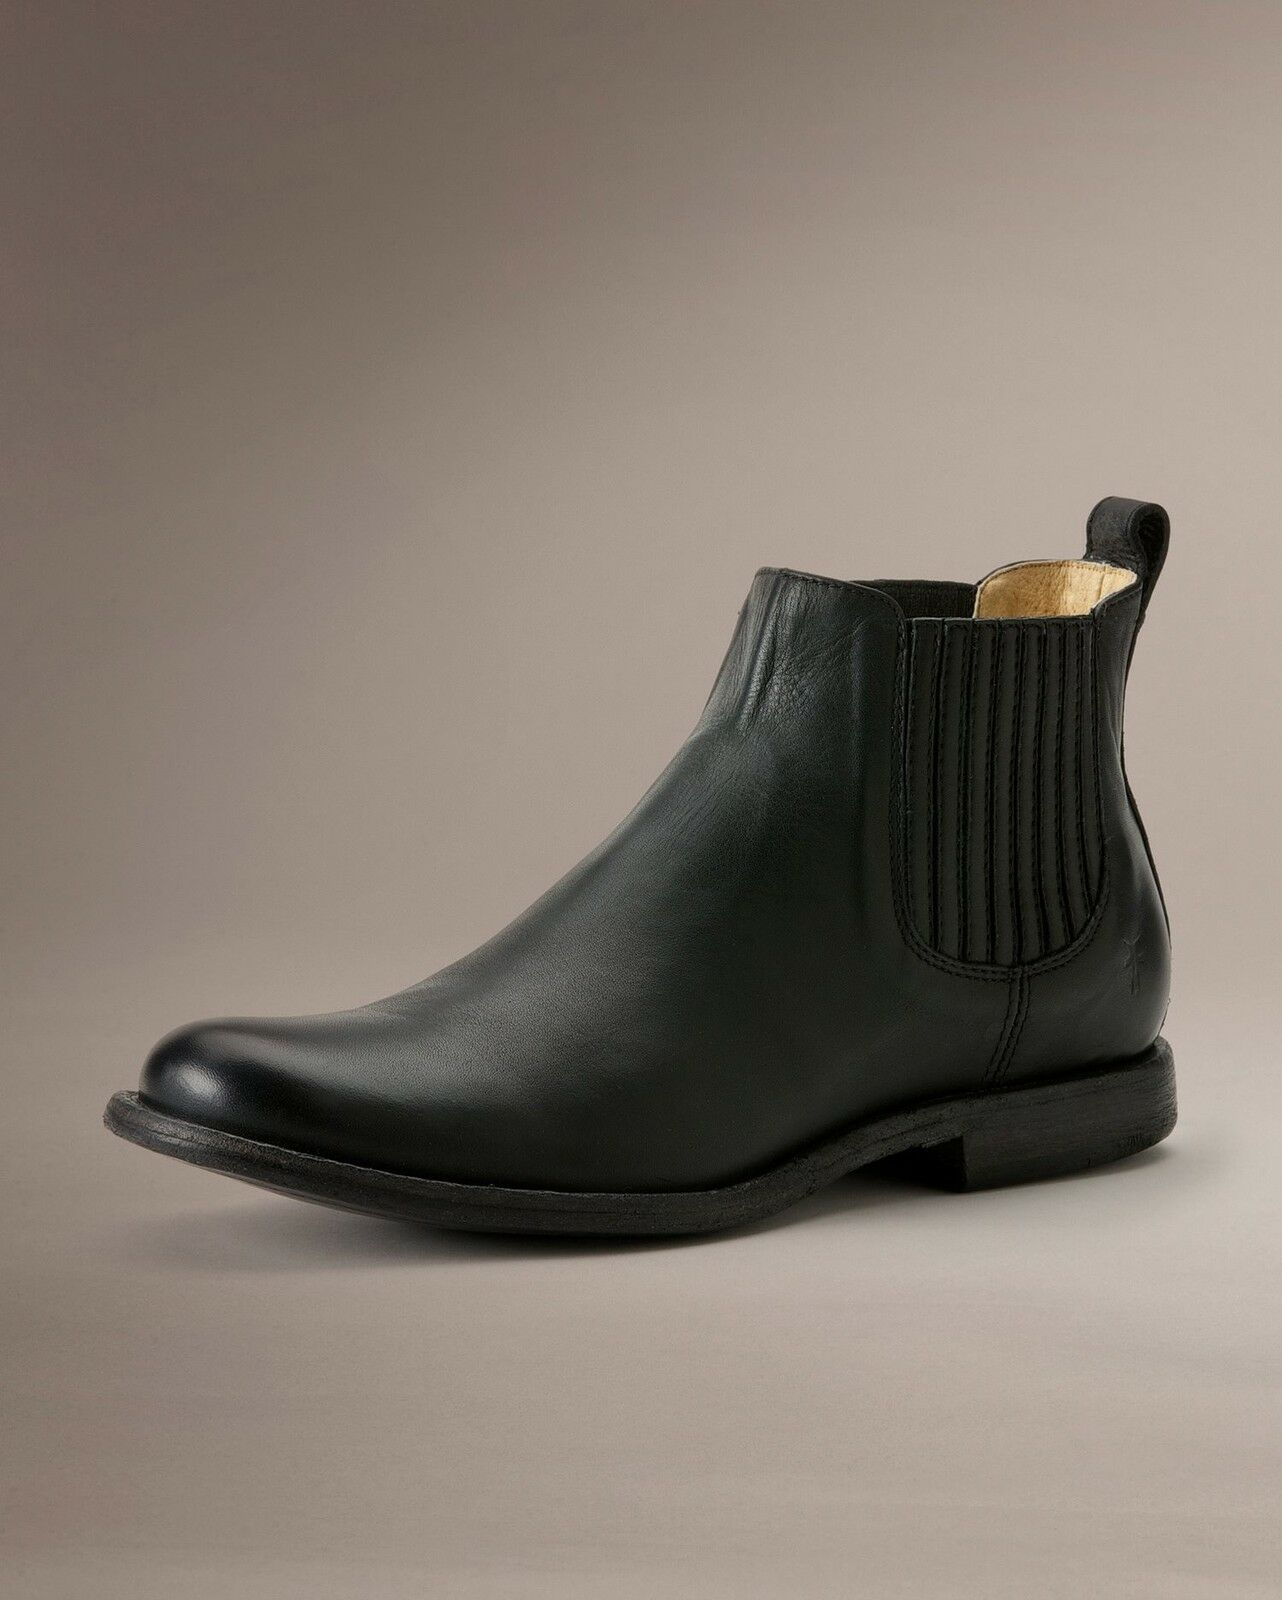 Mens Frye Boots Phillip Chelsea PullOn Boot Black Leather 87537 BLK